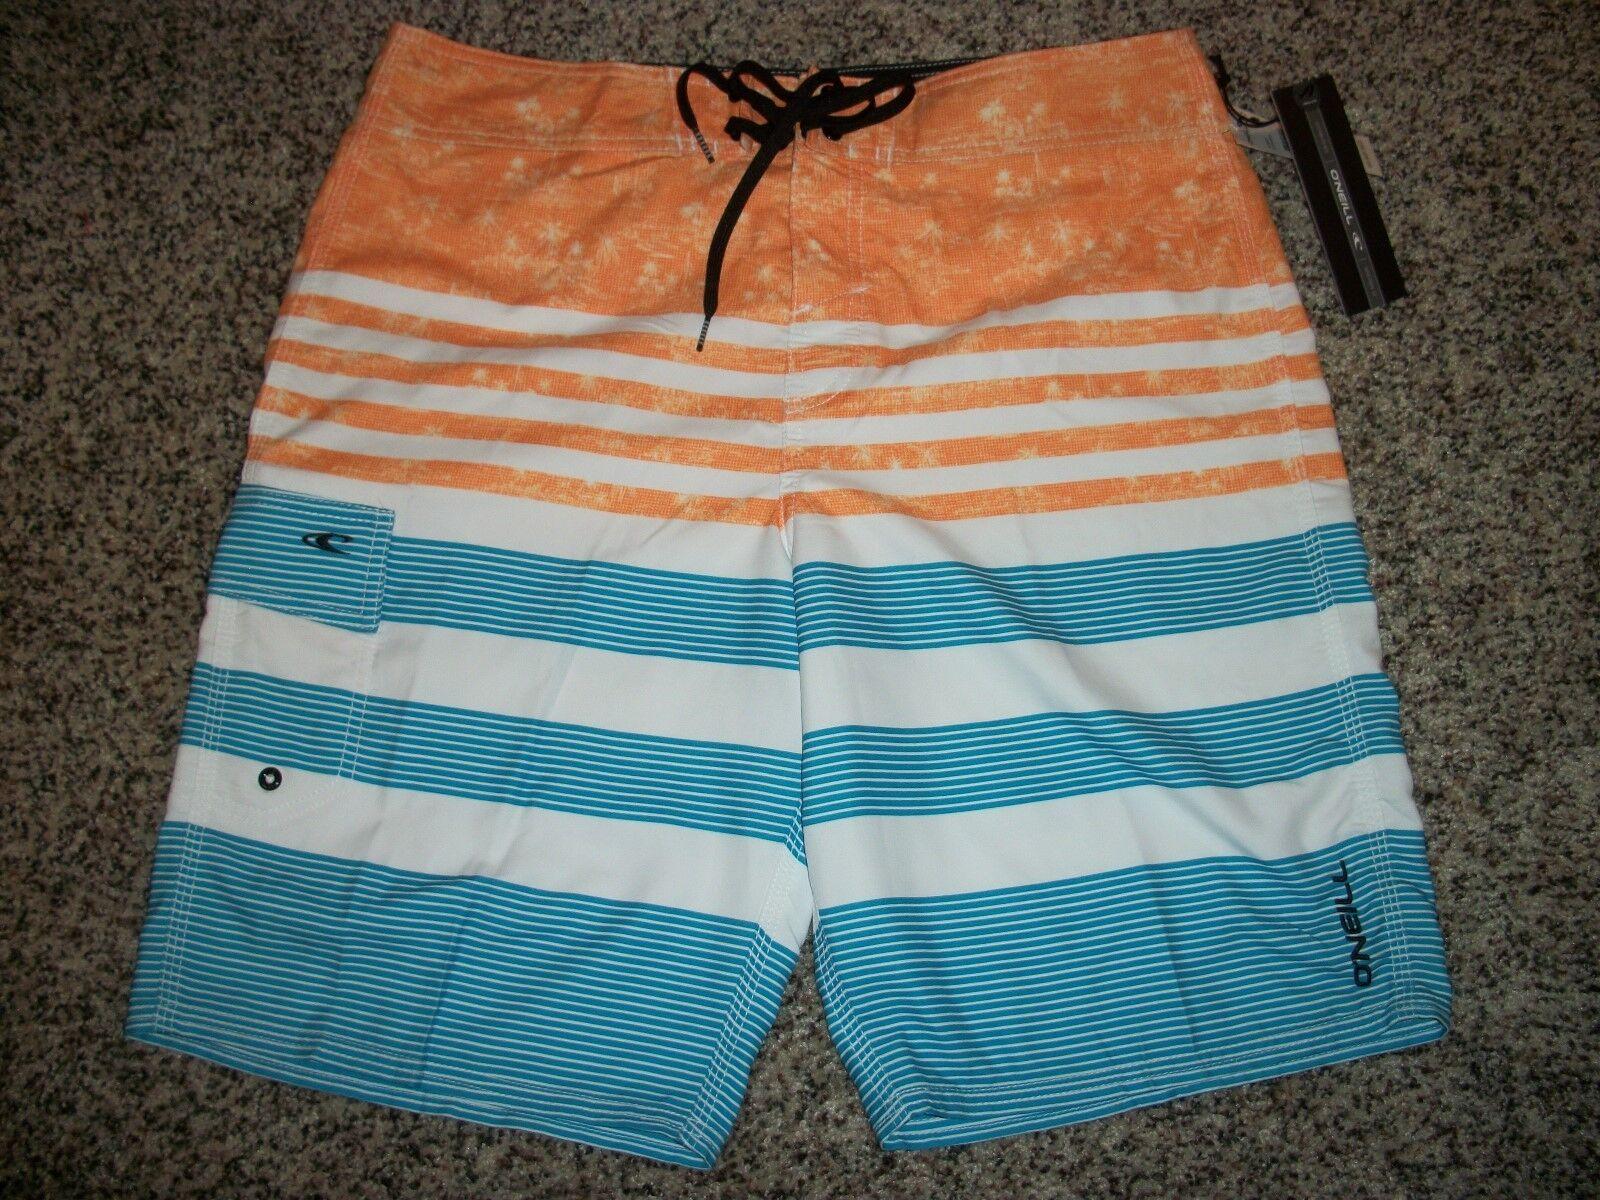 O'NEILL New NWT Mens 33 Board Swim Shorts White orange bluee Stripe